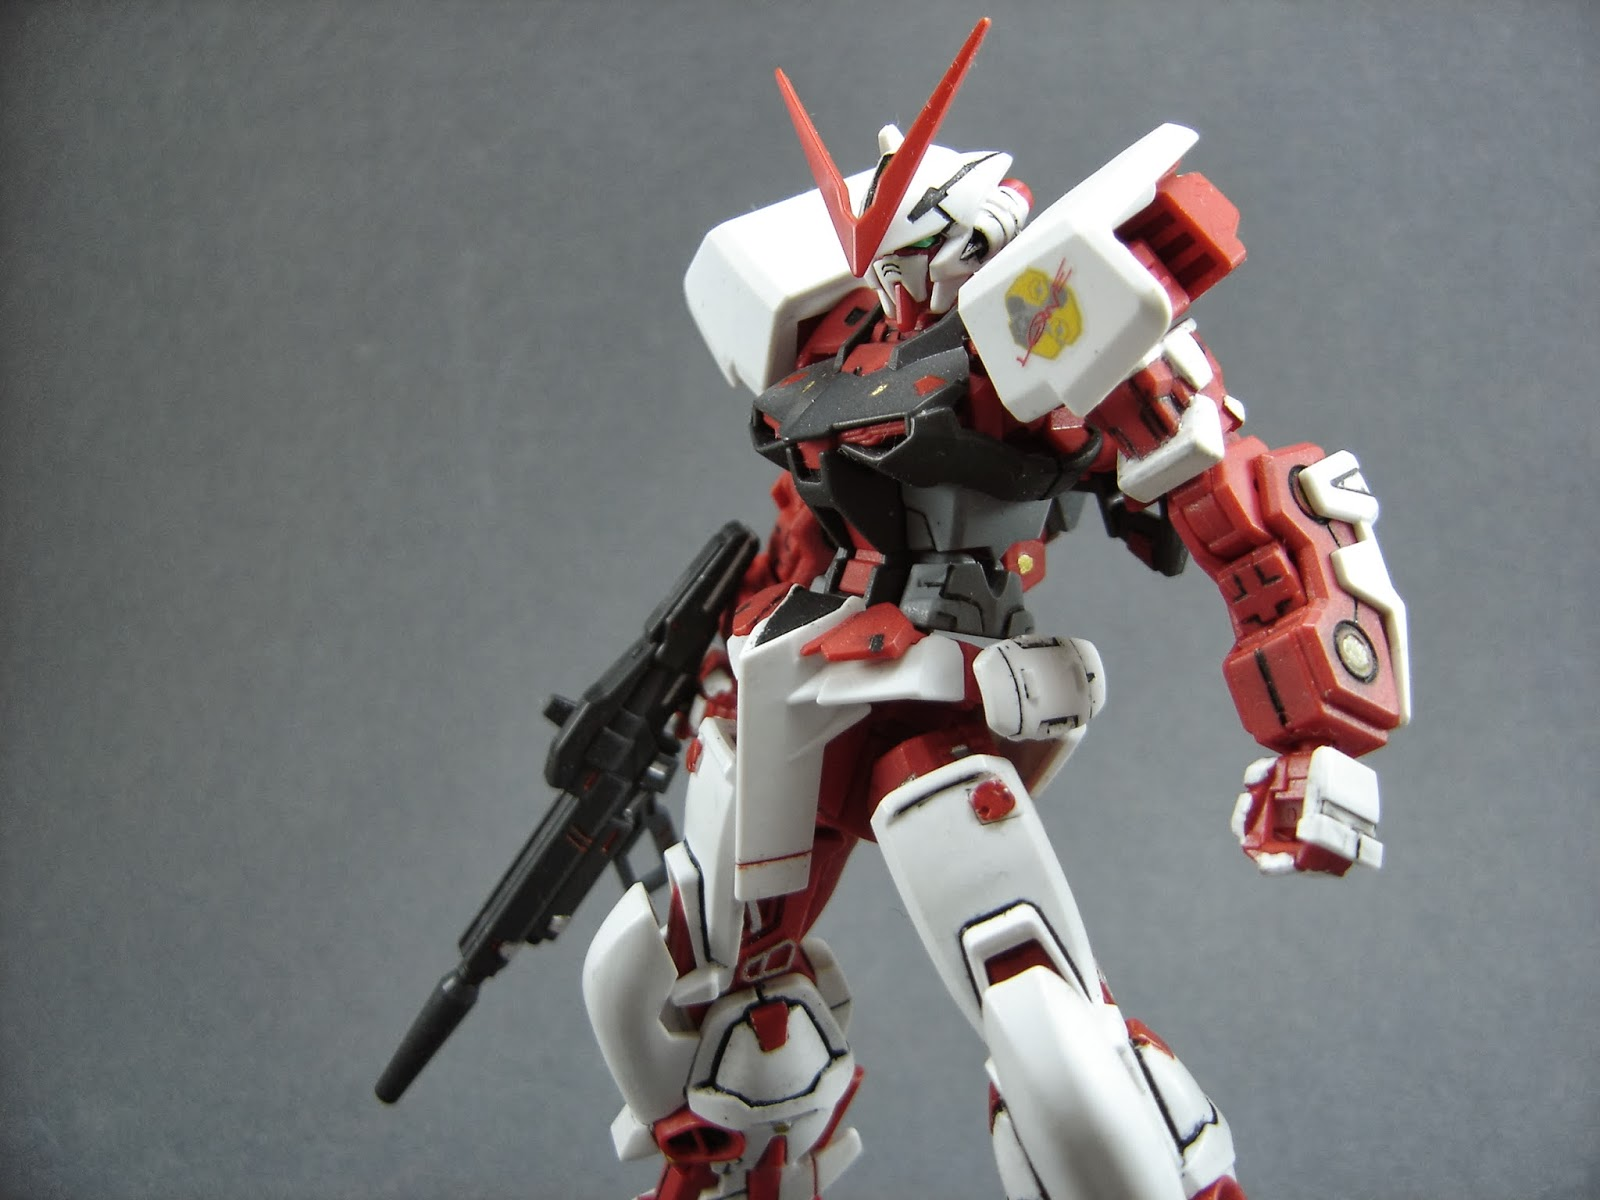 Lightning Ace's gundams: W.I.P. gundam astray red frame ...